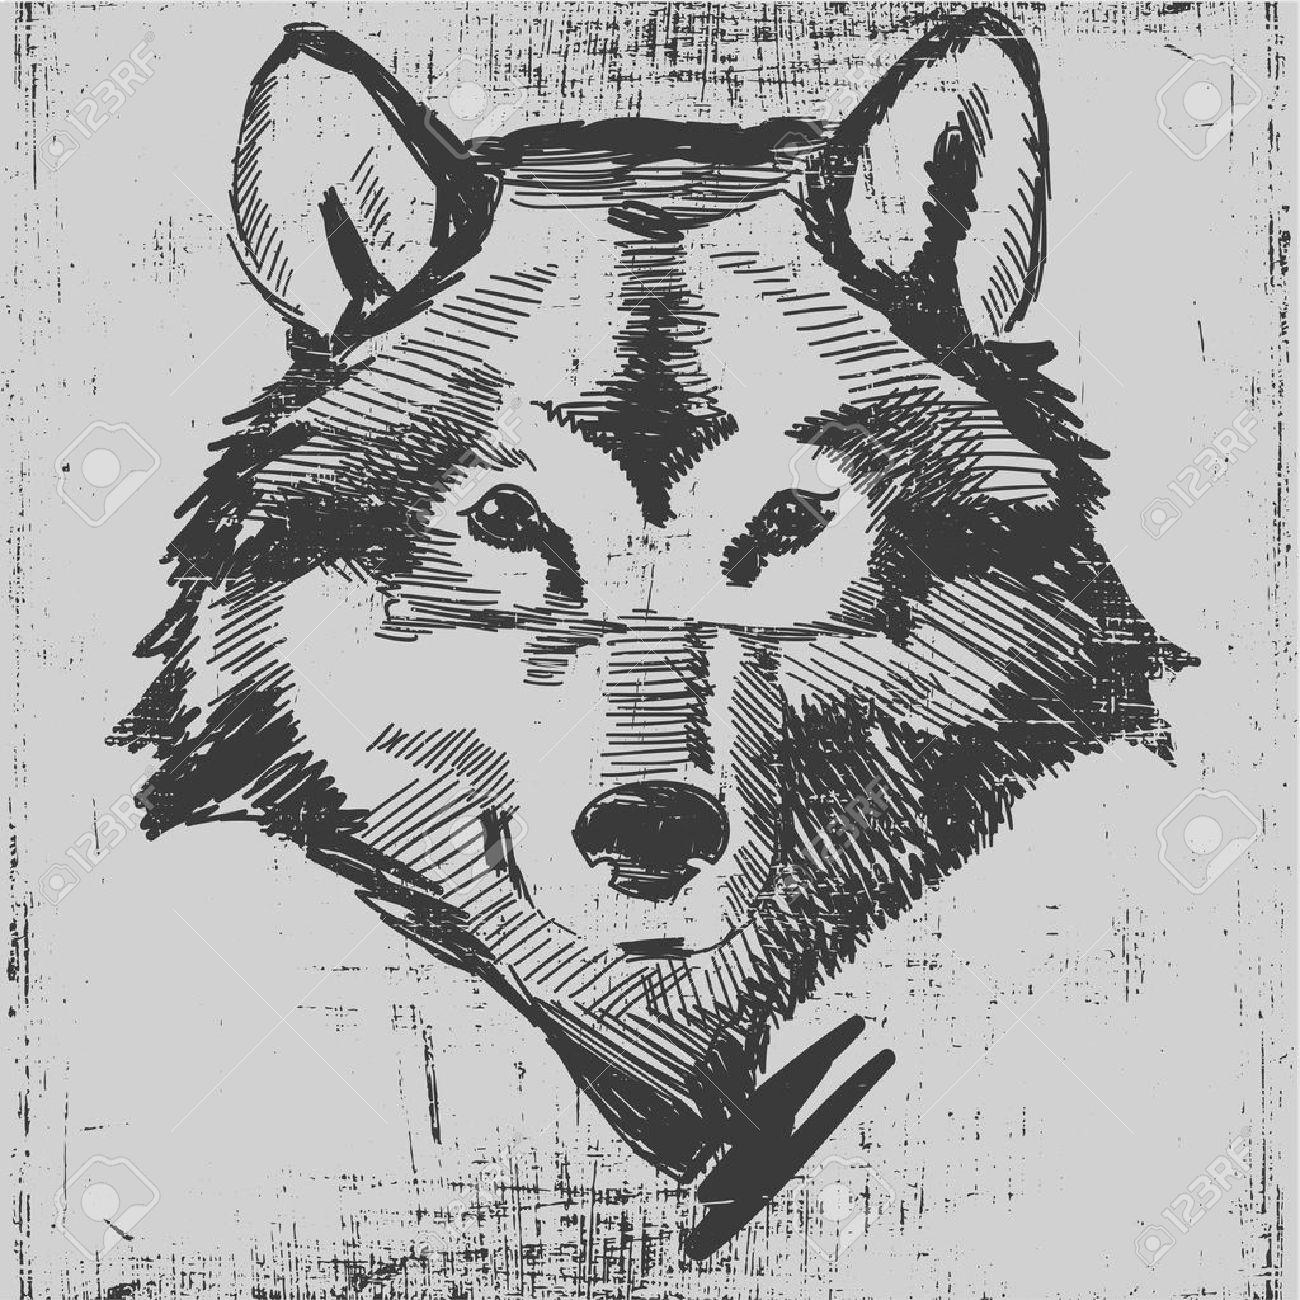 Wolf Head: Wolf Head Hand Drawn Sketch Grunge Texture Engraving Style  Illustration